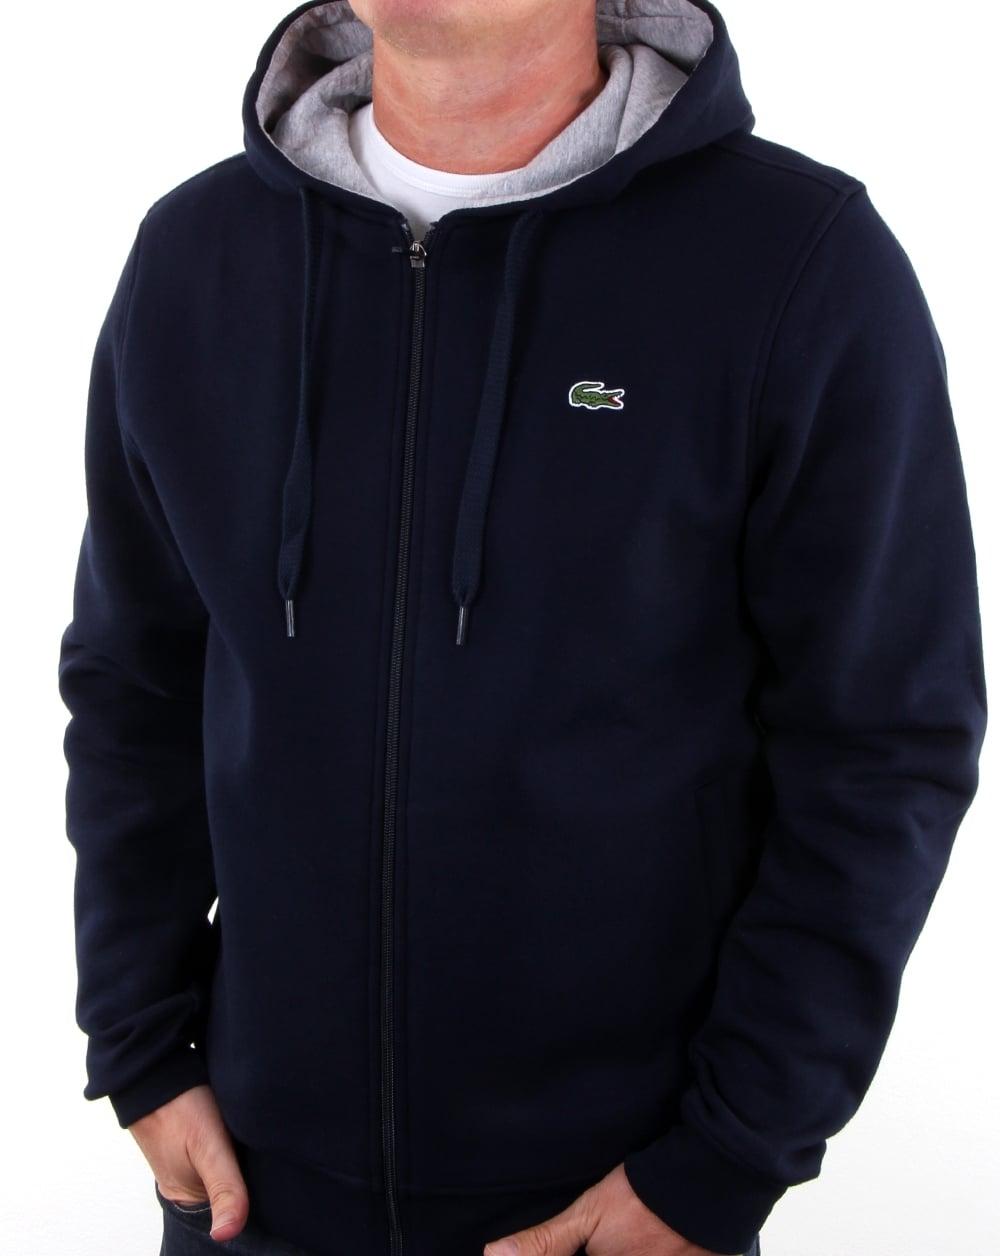 672d33fcf1c1 Lacoste Lacoste Hooded Full Zip Sweatshirt Navy Silver Chine